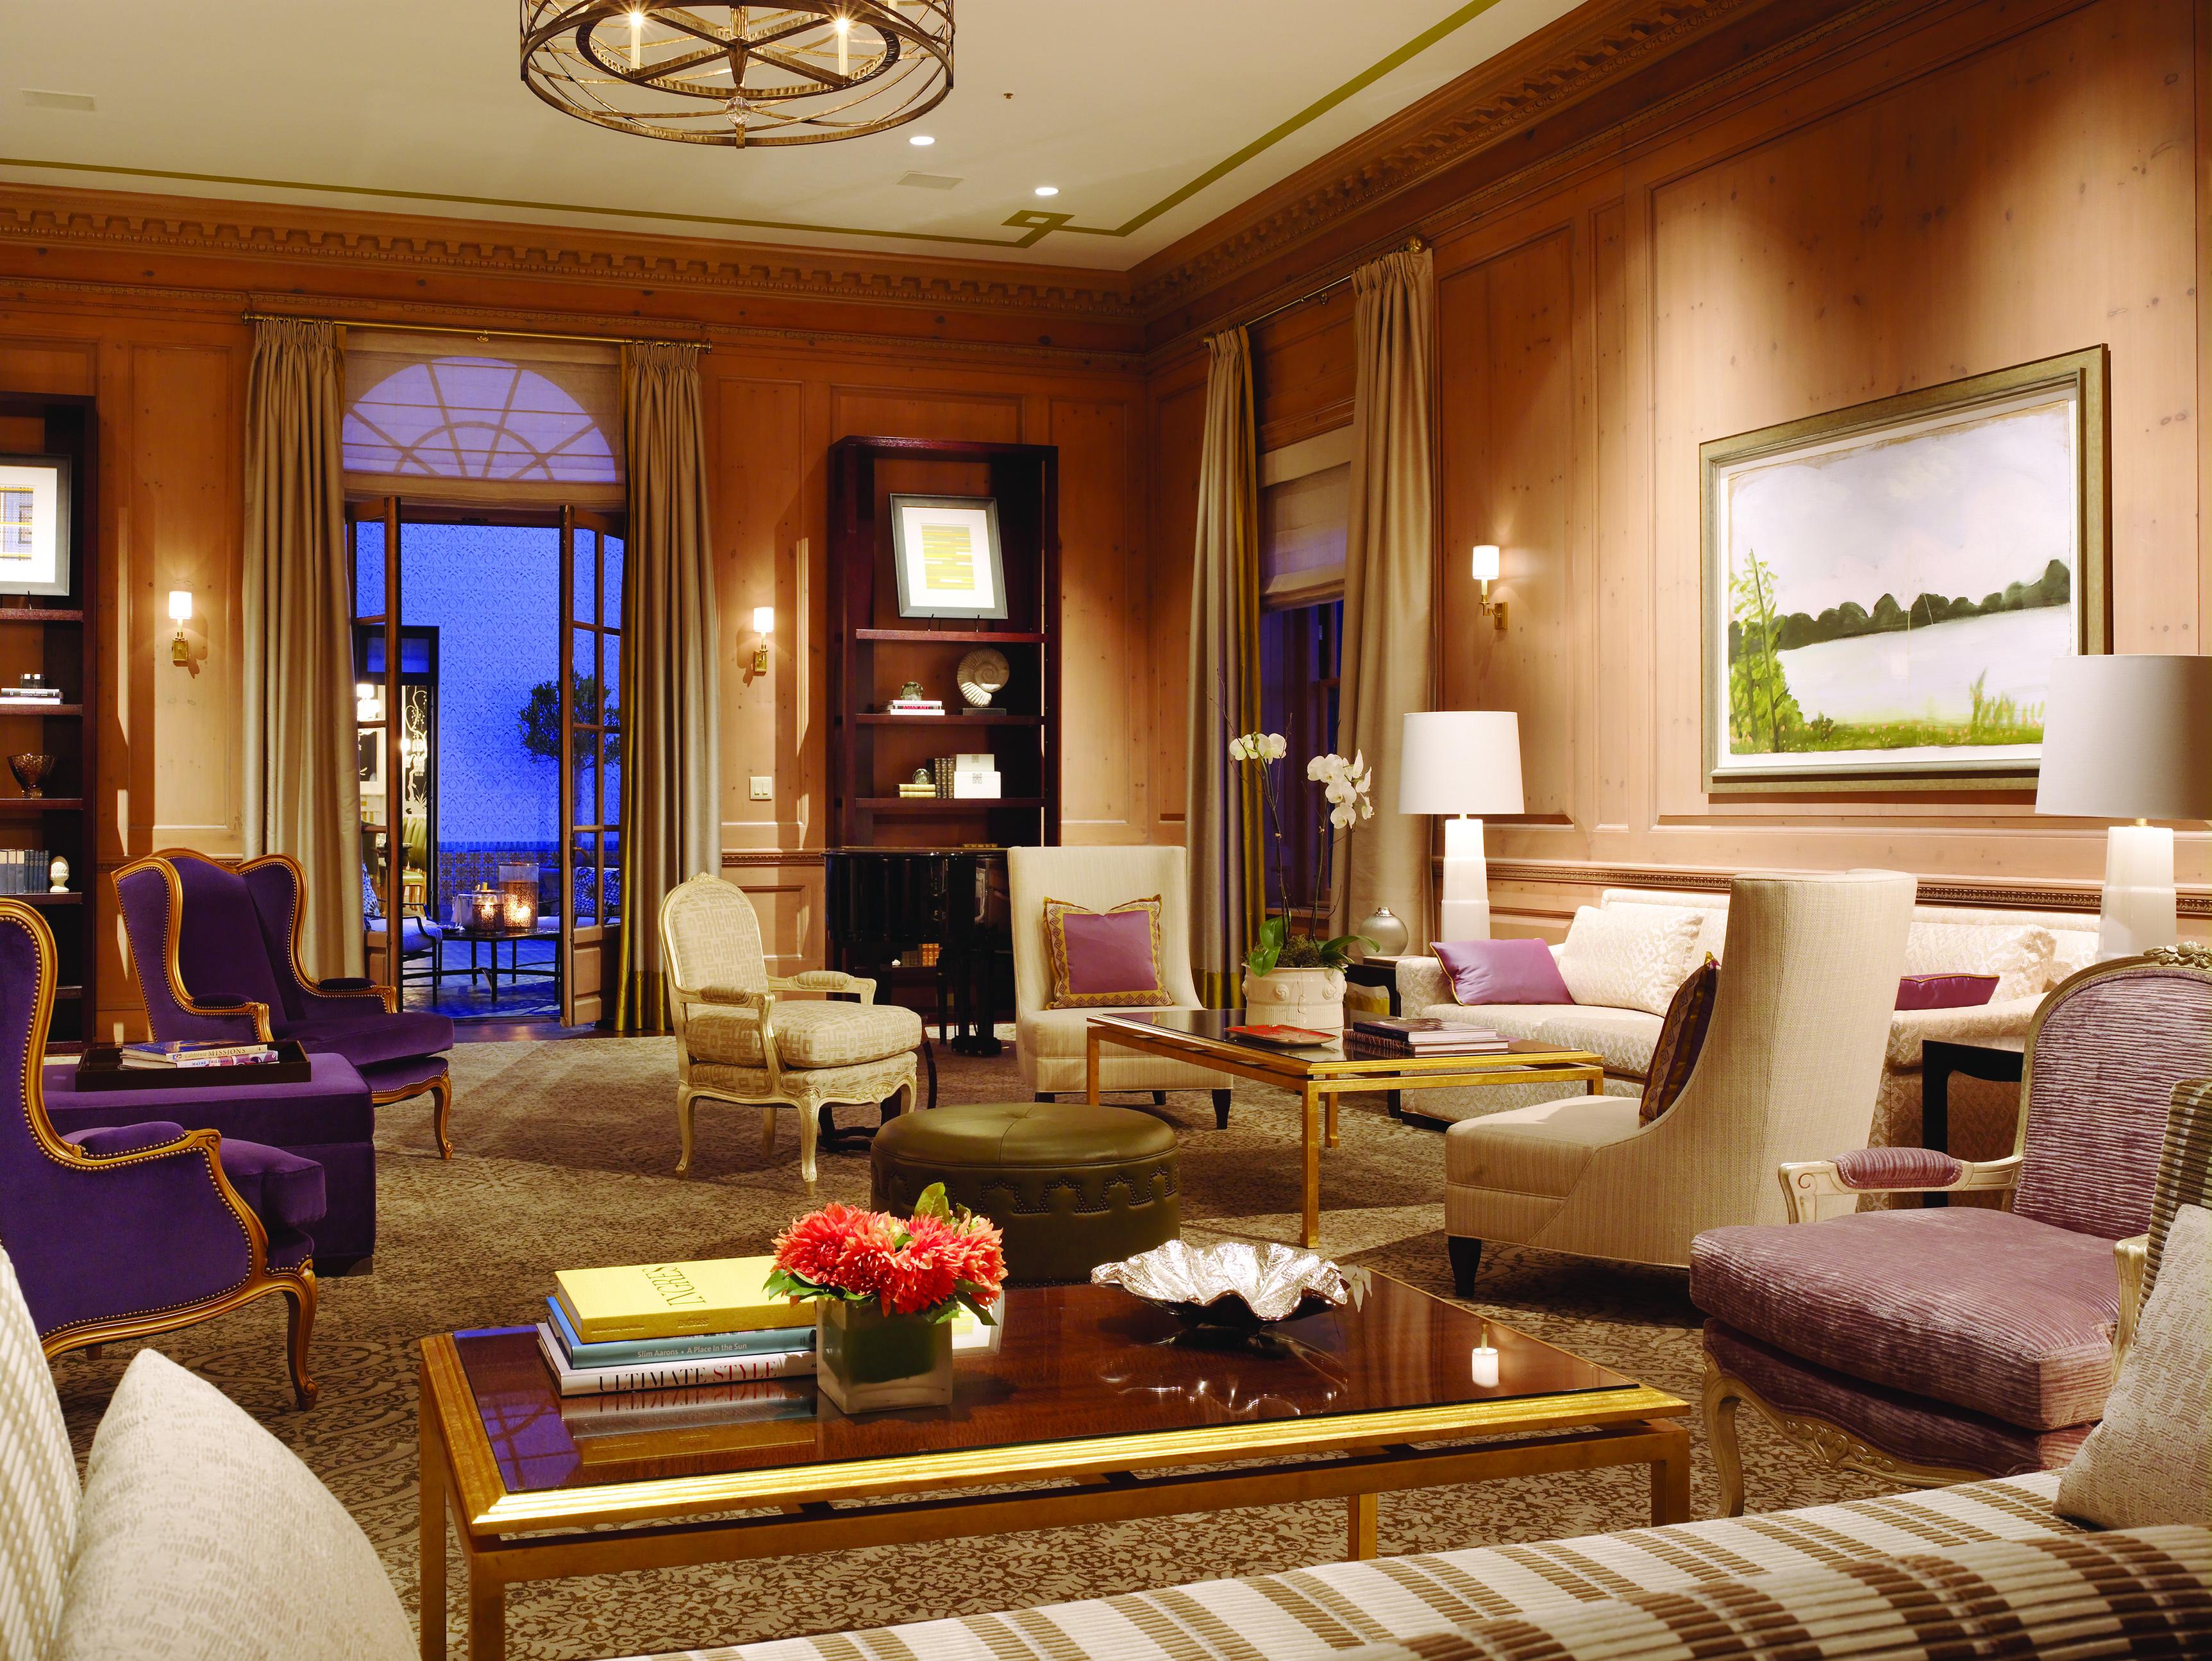 Suite Dreams Series 6 The Penthouse Suite The